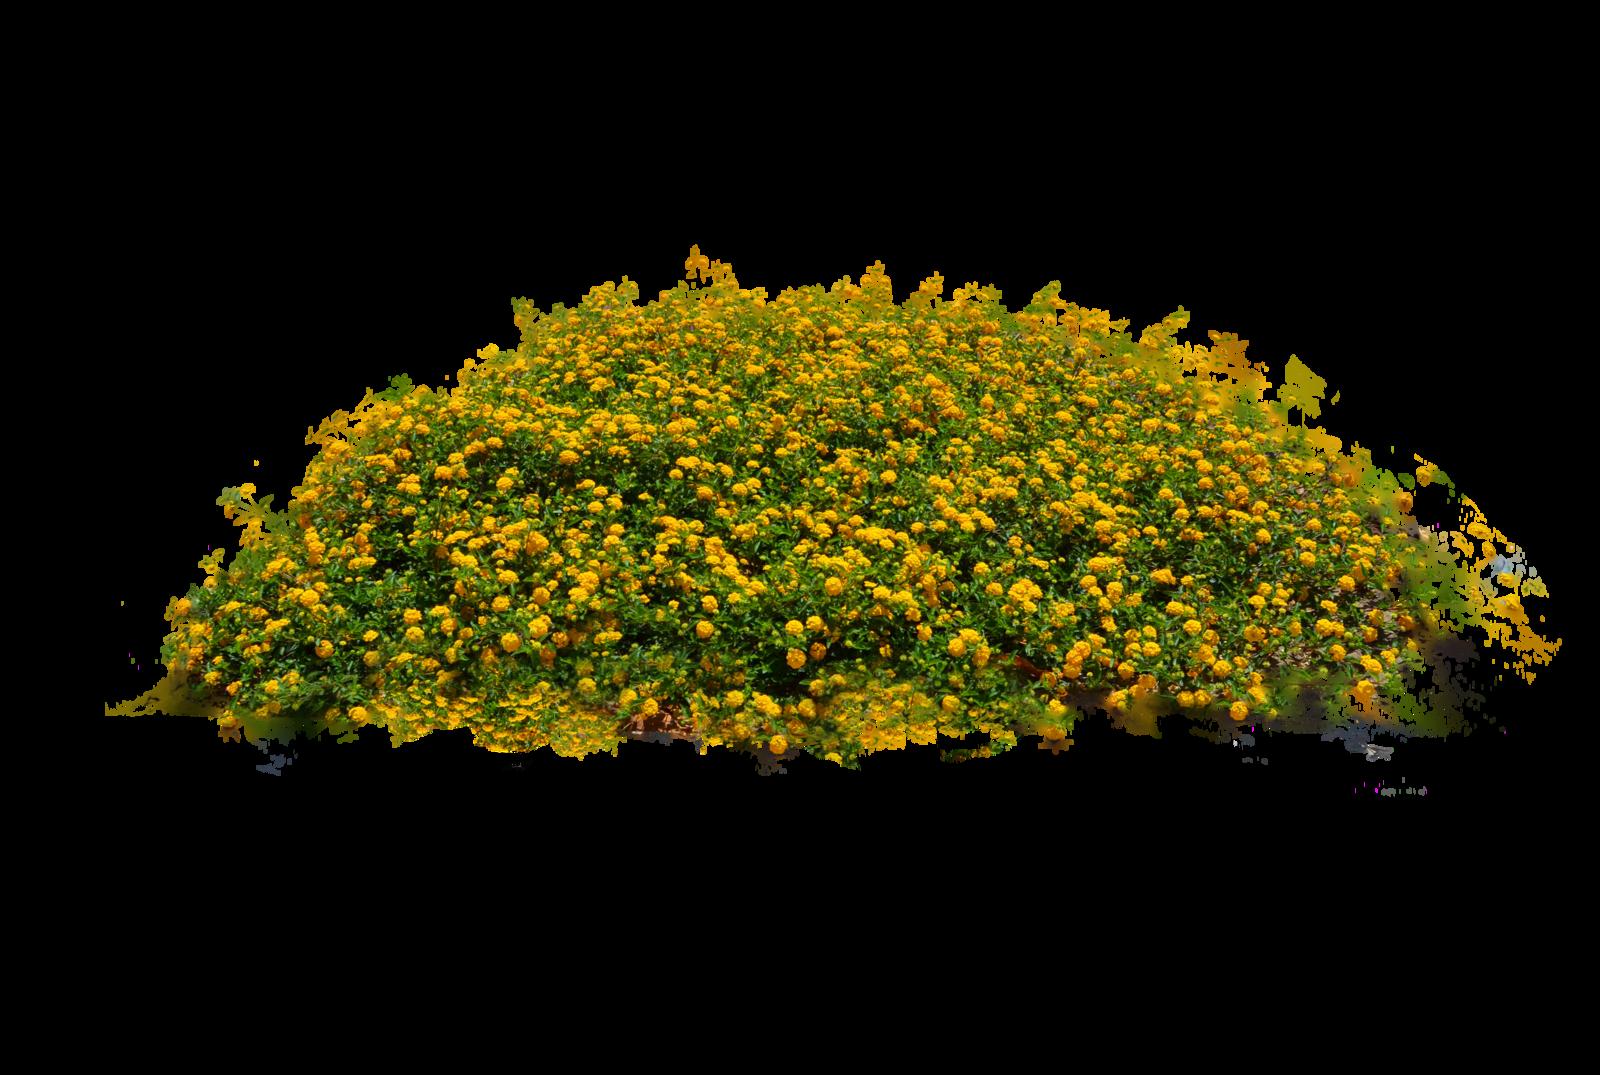 Bush view free icons. Flower plant png